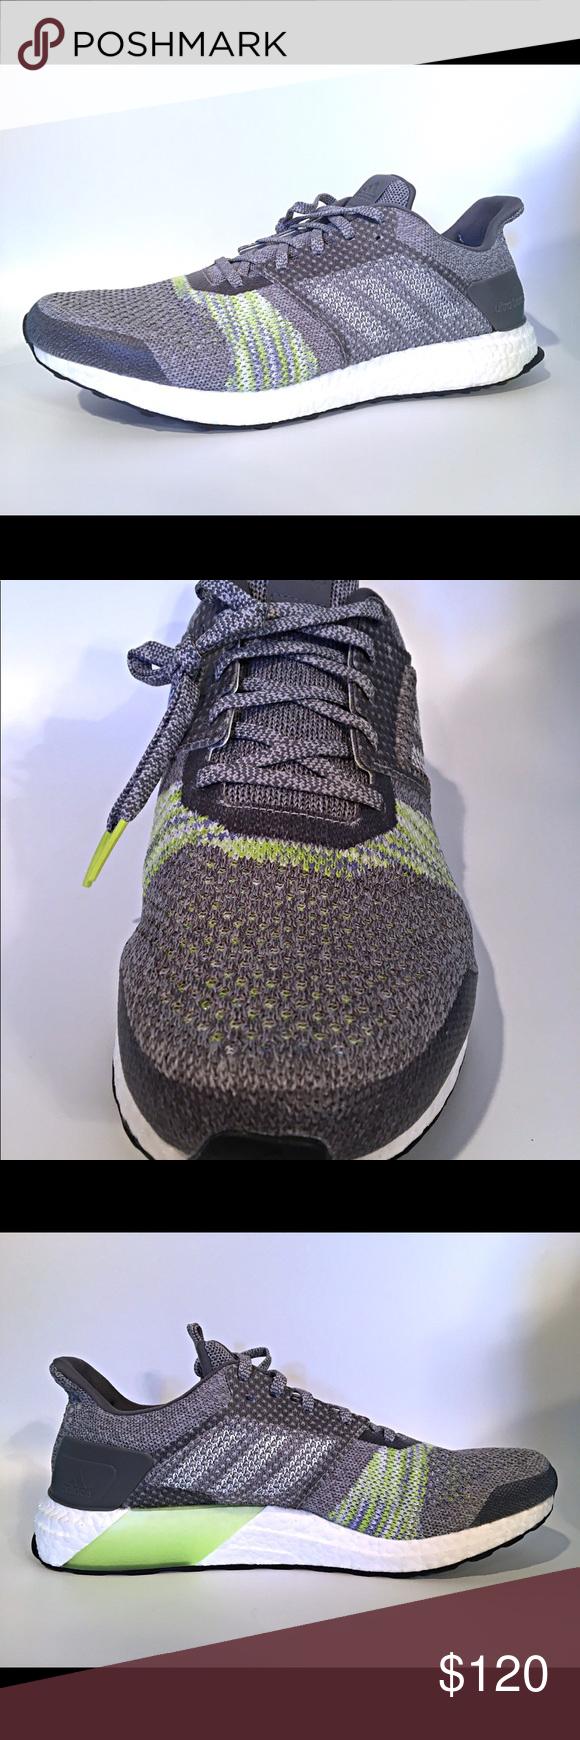 f2e952b11 Men s Adidas UltraBOOST ST Size 13 Running -Grey- Men s Adidas UltraBOOST ST  Size 13 Running Shoes Grey Solar Slime (CQ2147) New with Original Box  Retail  ...